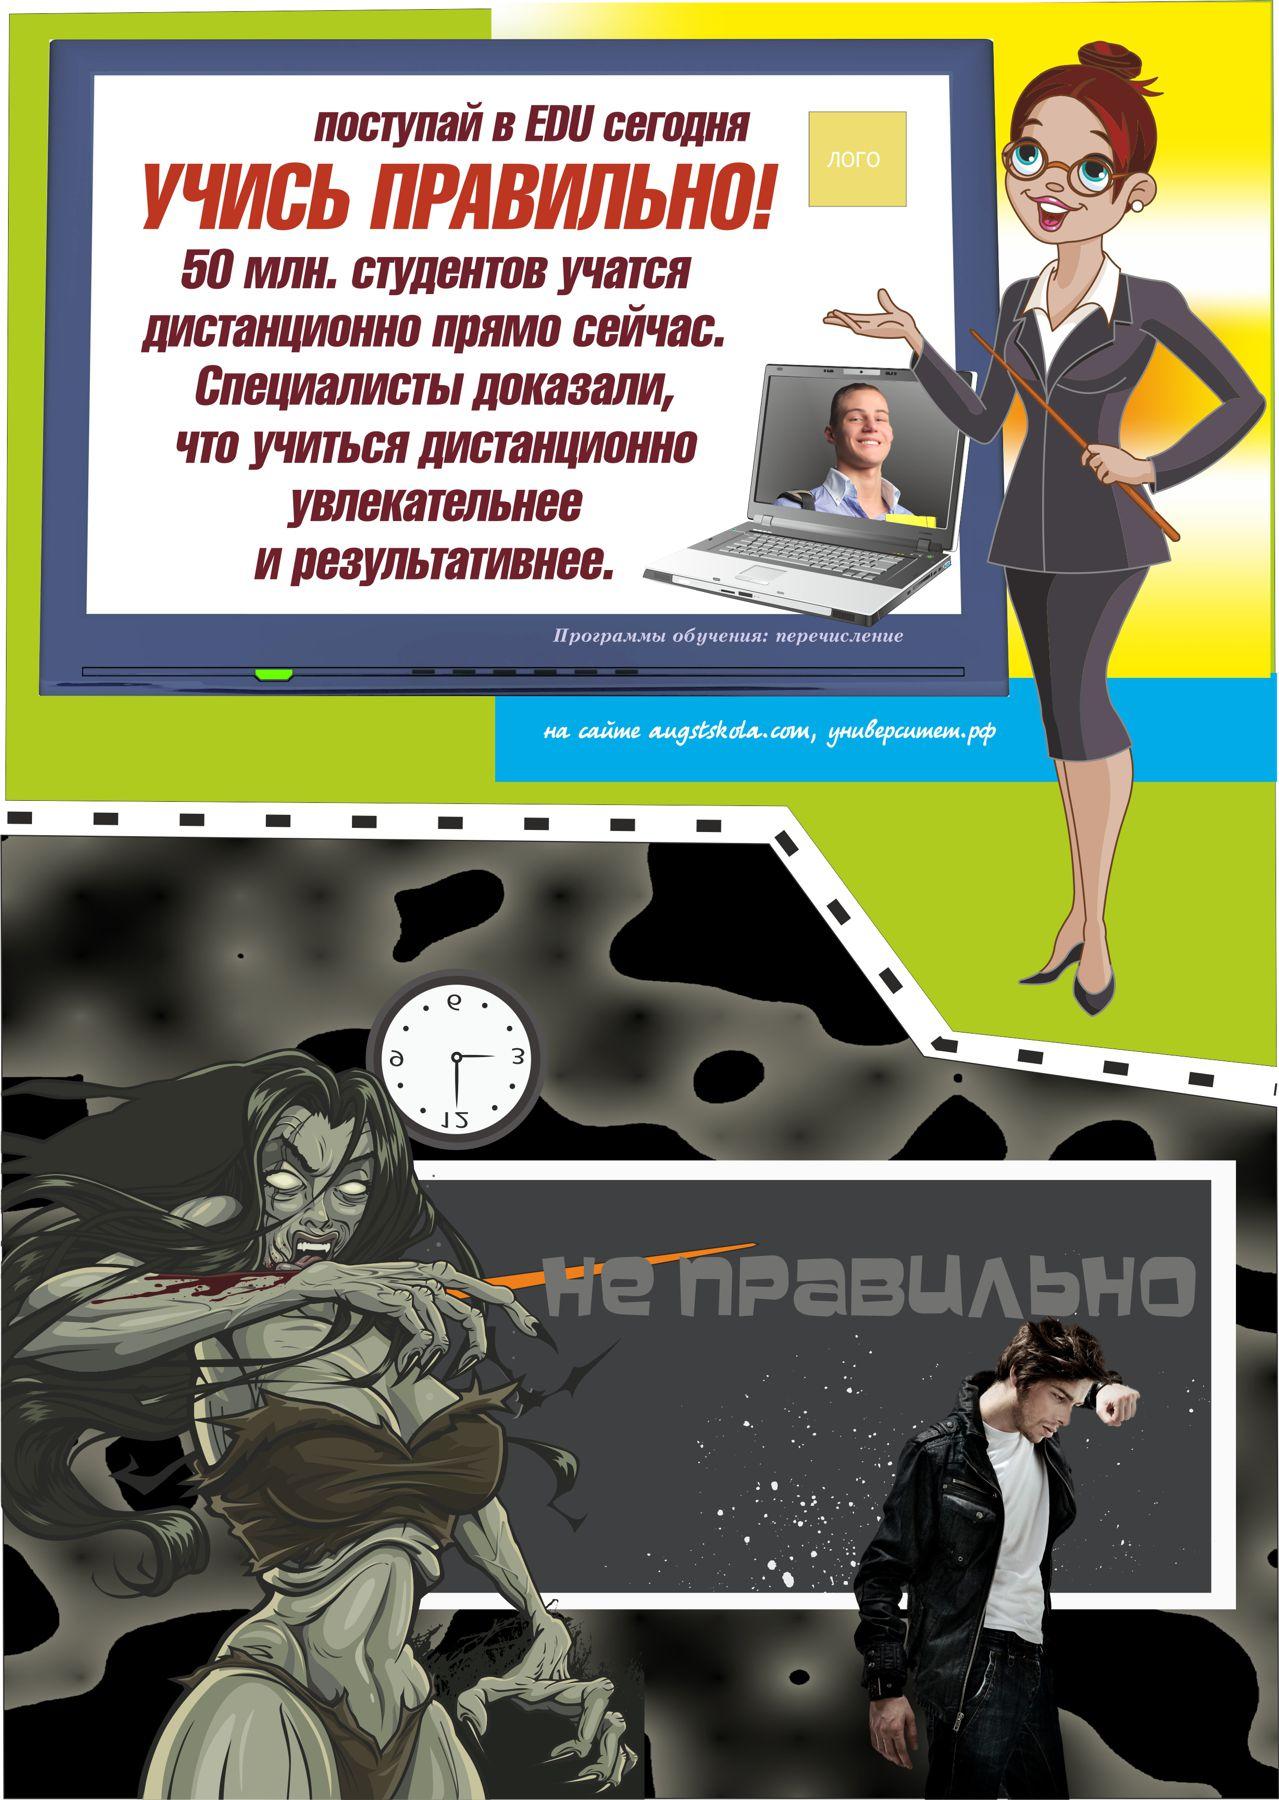 Университету требуется креативный плакат! фото f_75652ee40e5080bf.jpg